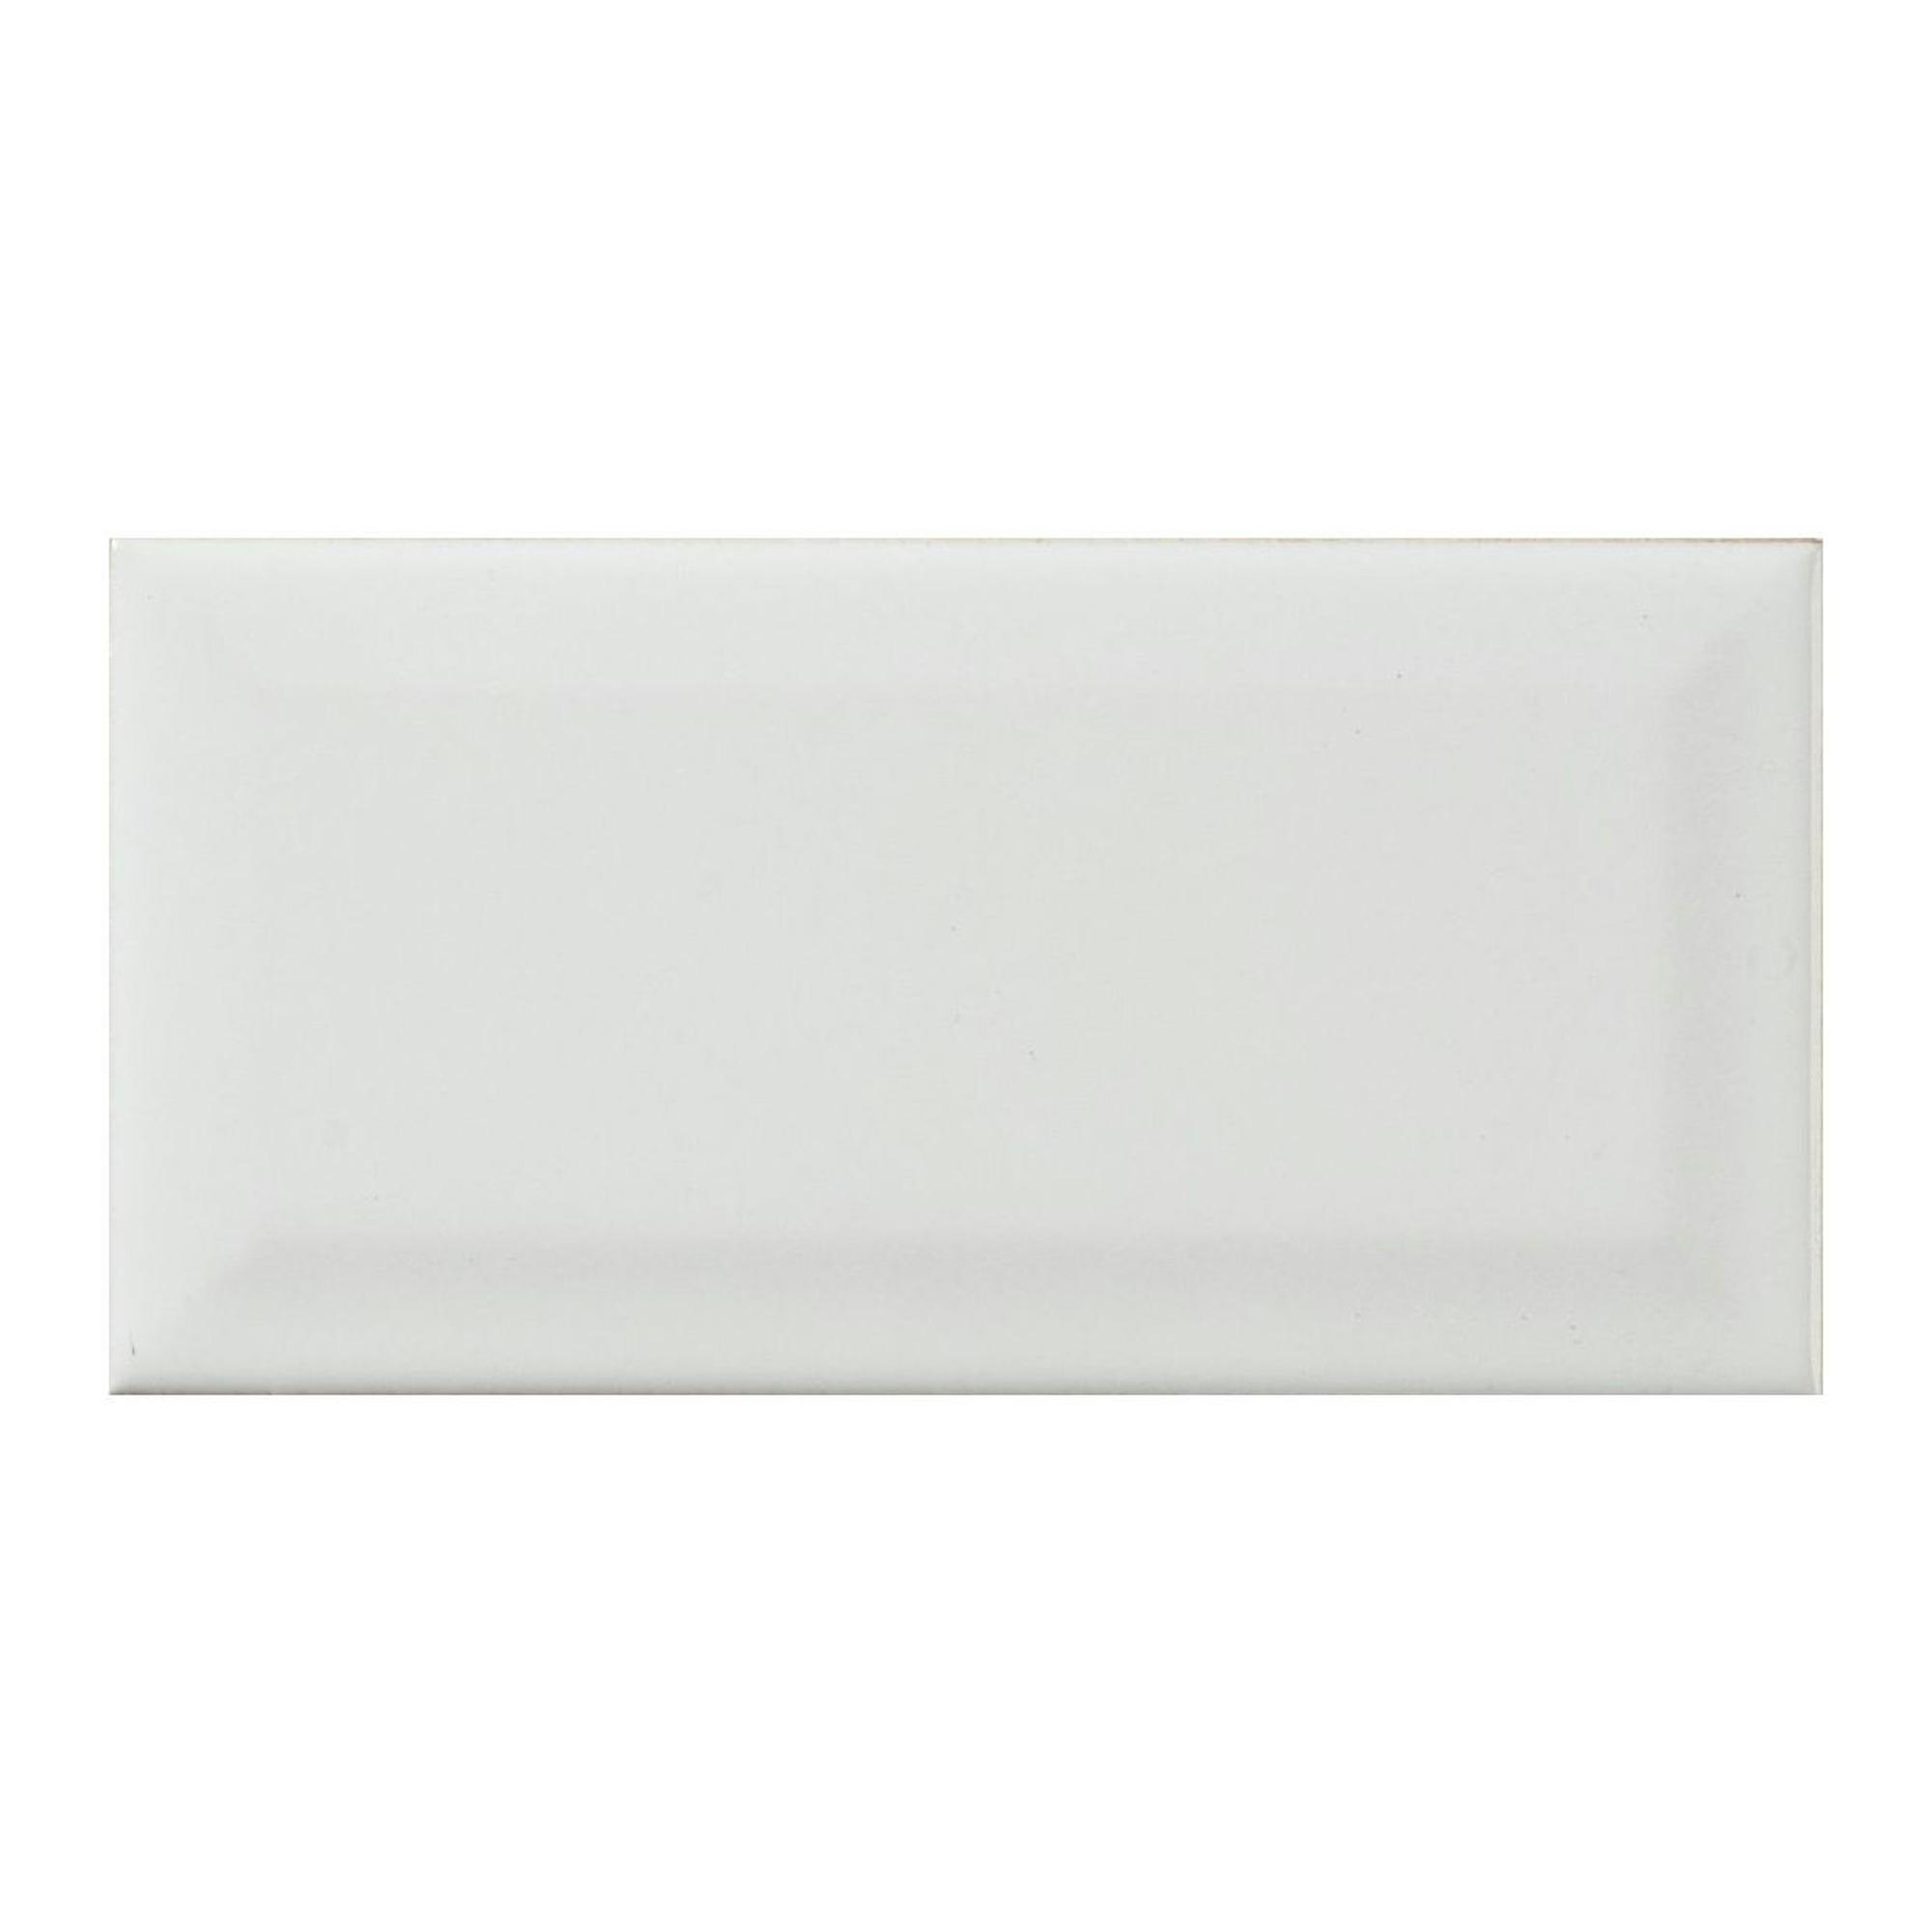 Wandtegel metro wit 7 5x15cm 0 5 m wandtegels tegels - Tegel metro wit ...